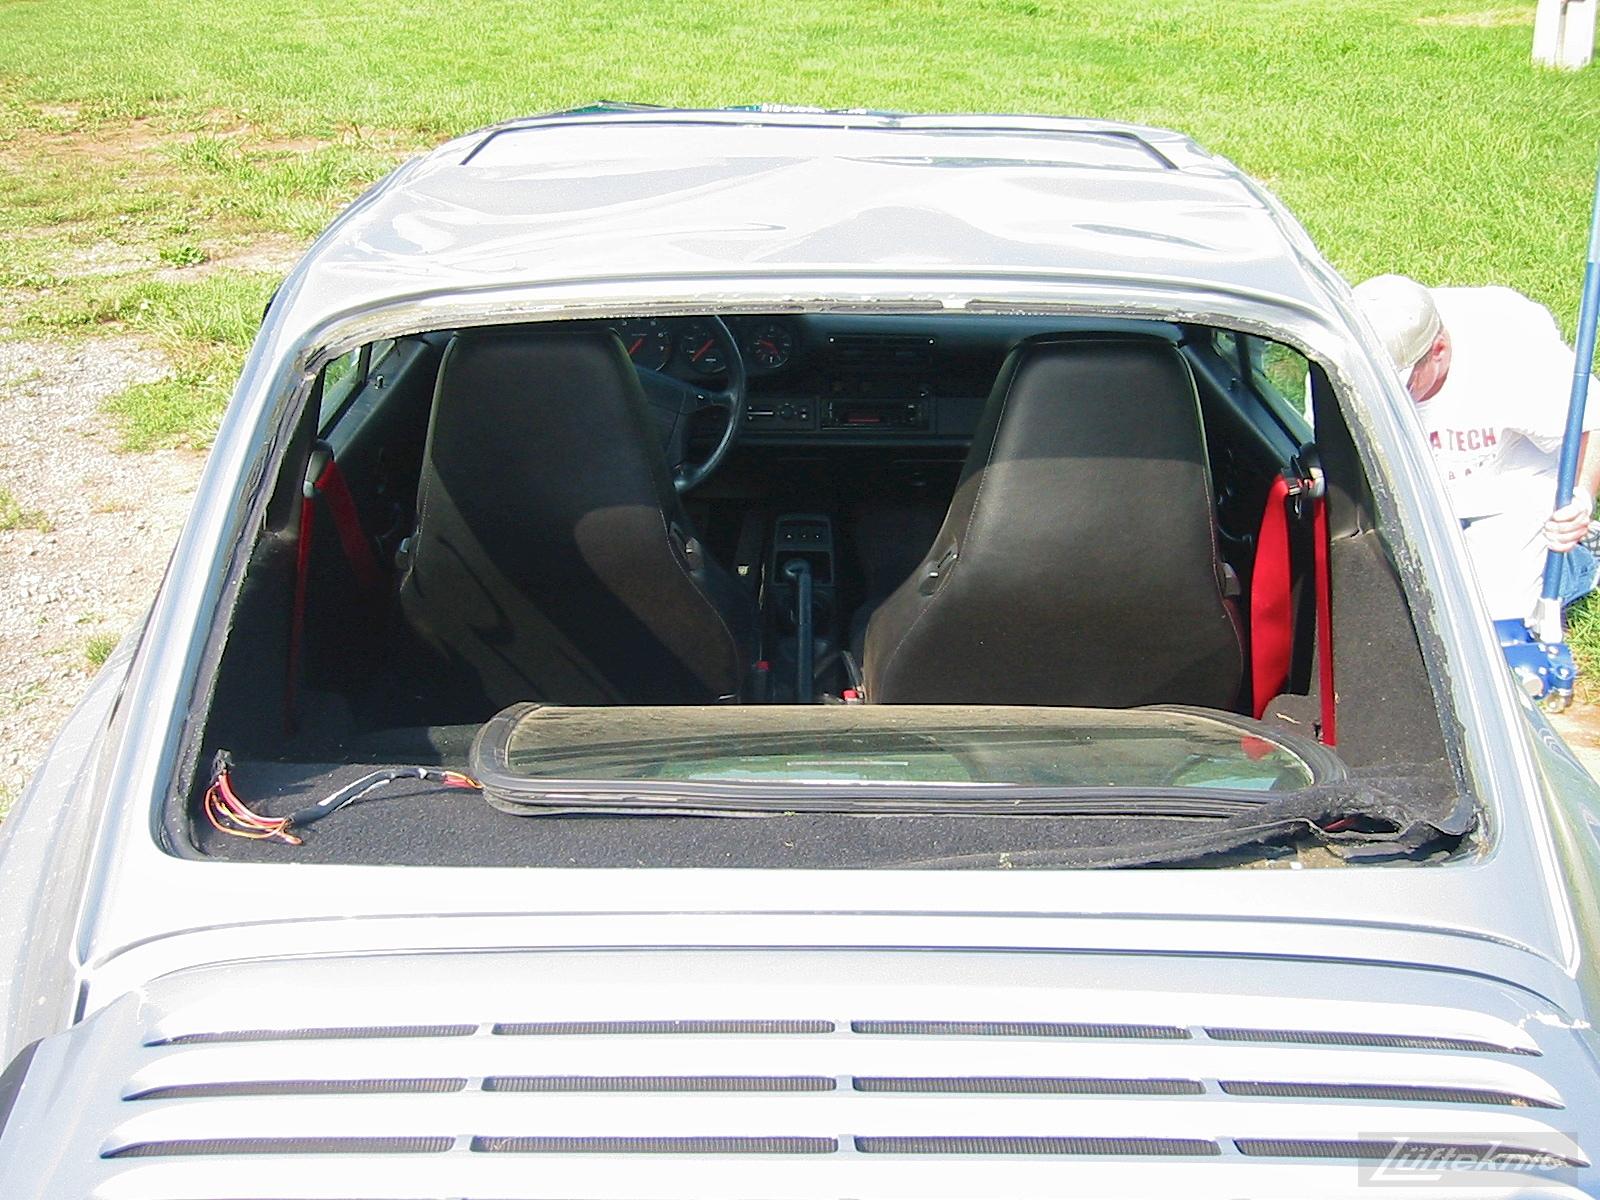 Freshly wrecked Porsche 964 RS America with broken windows